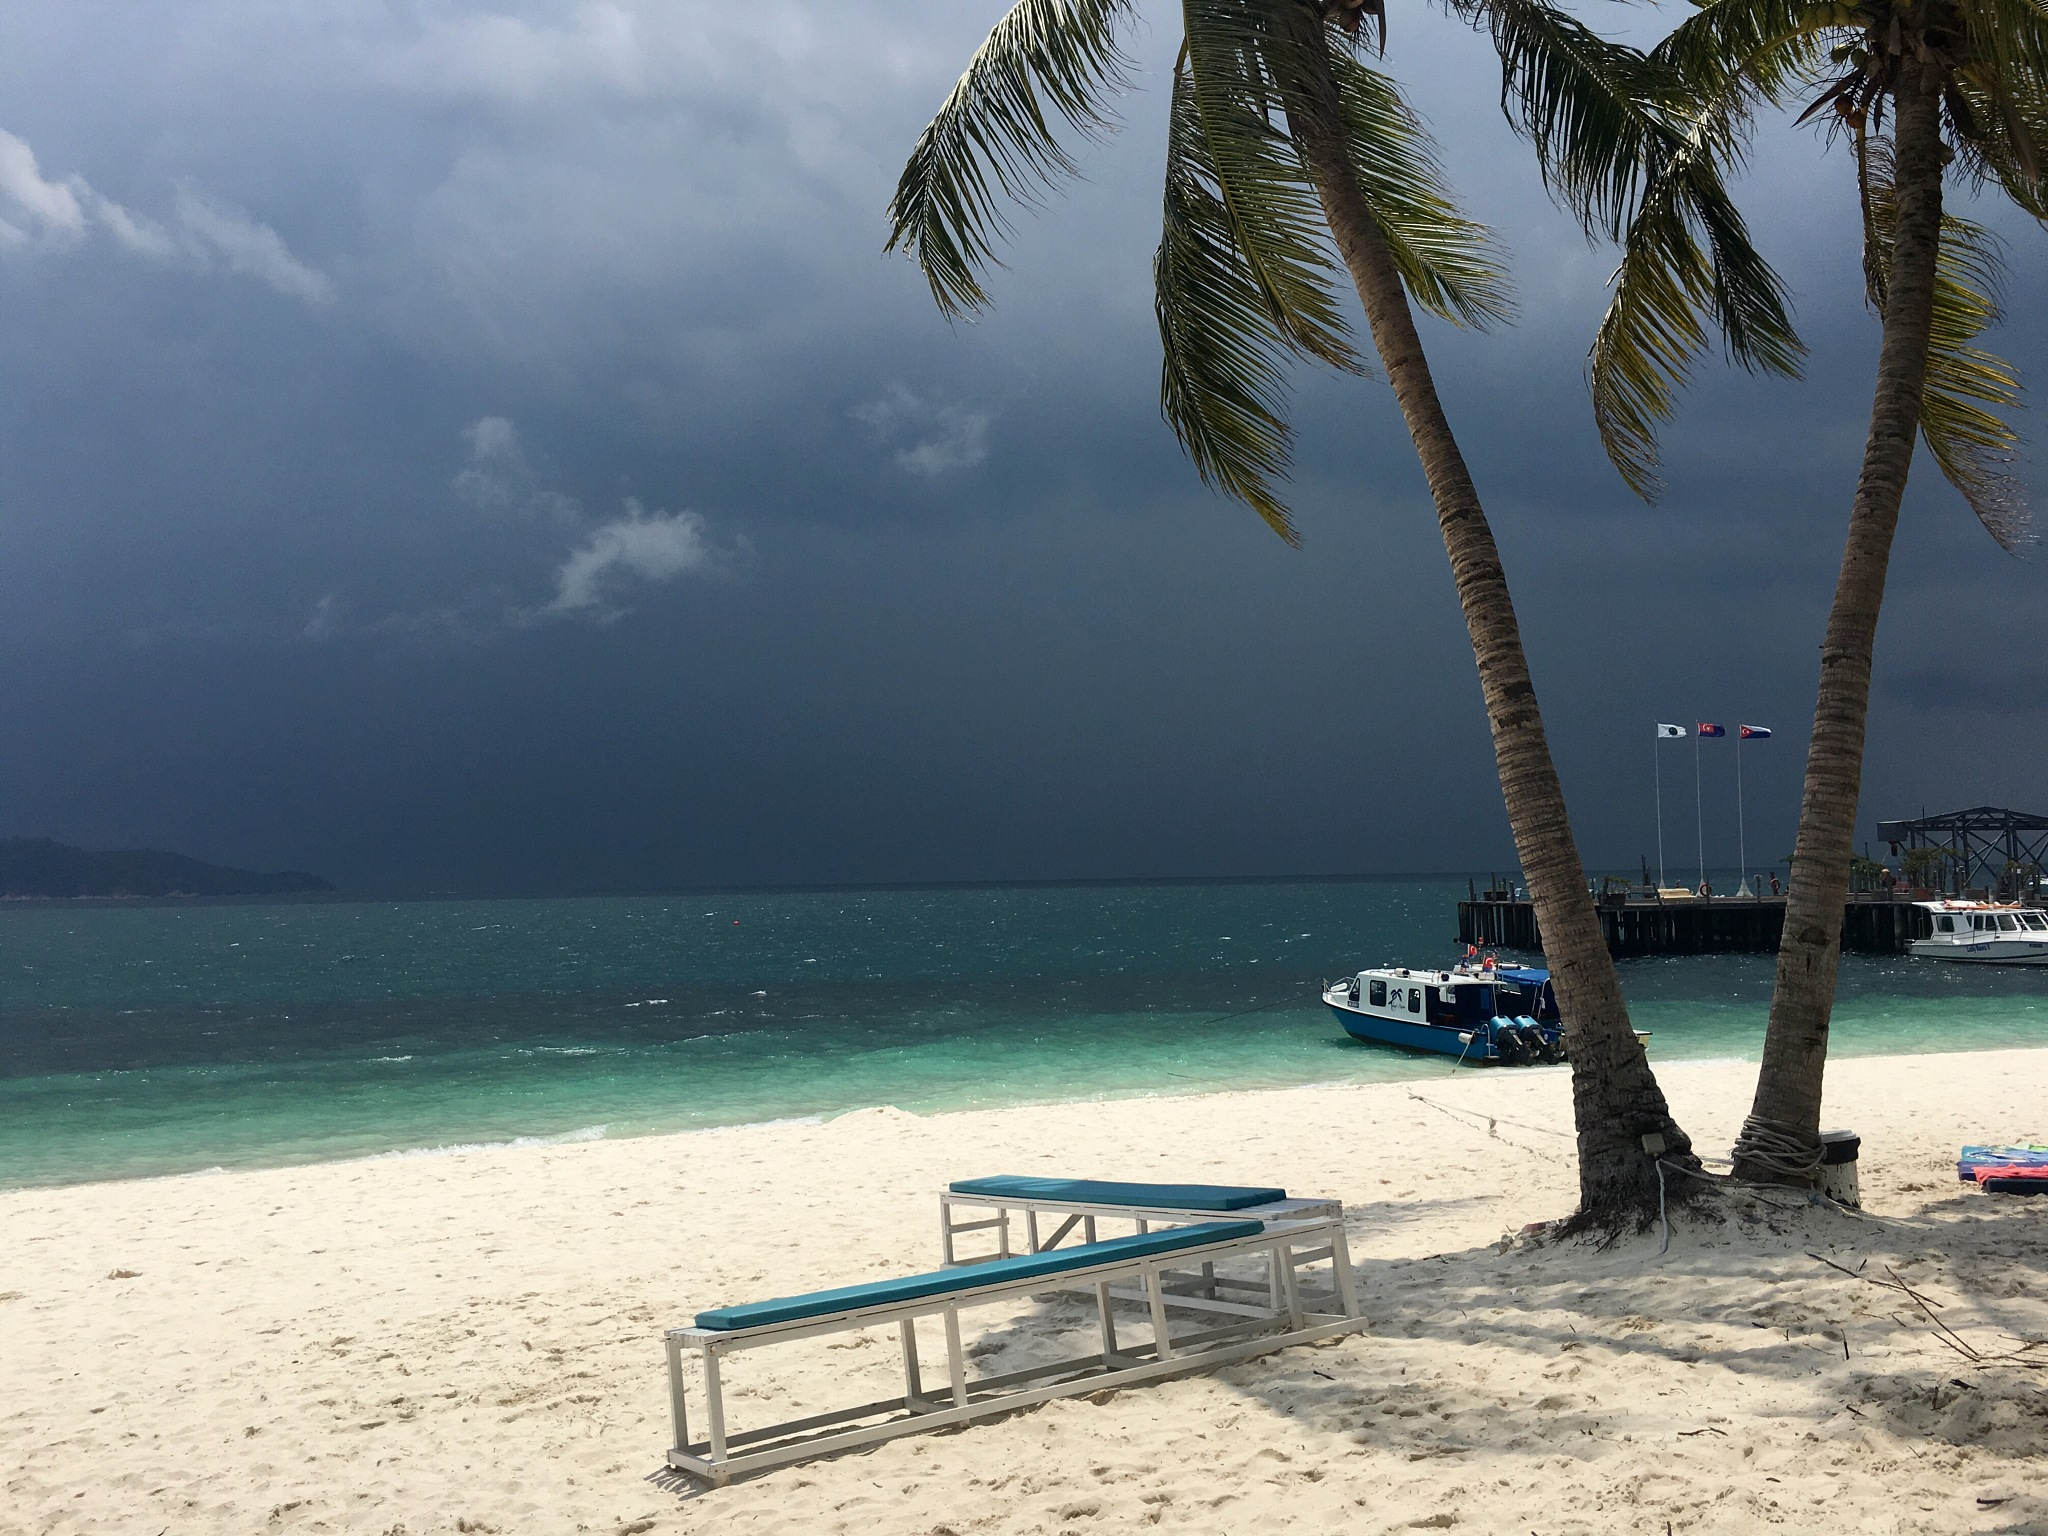 The tempest cometh. Rawa Island, Johor, Malaysia by Illka Gobius